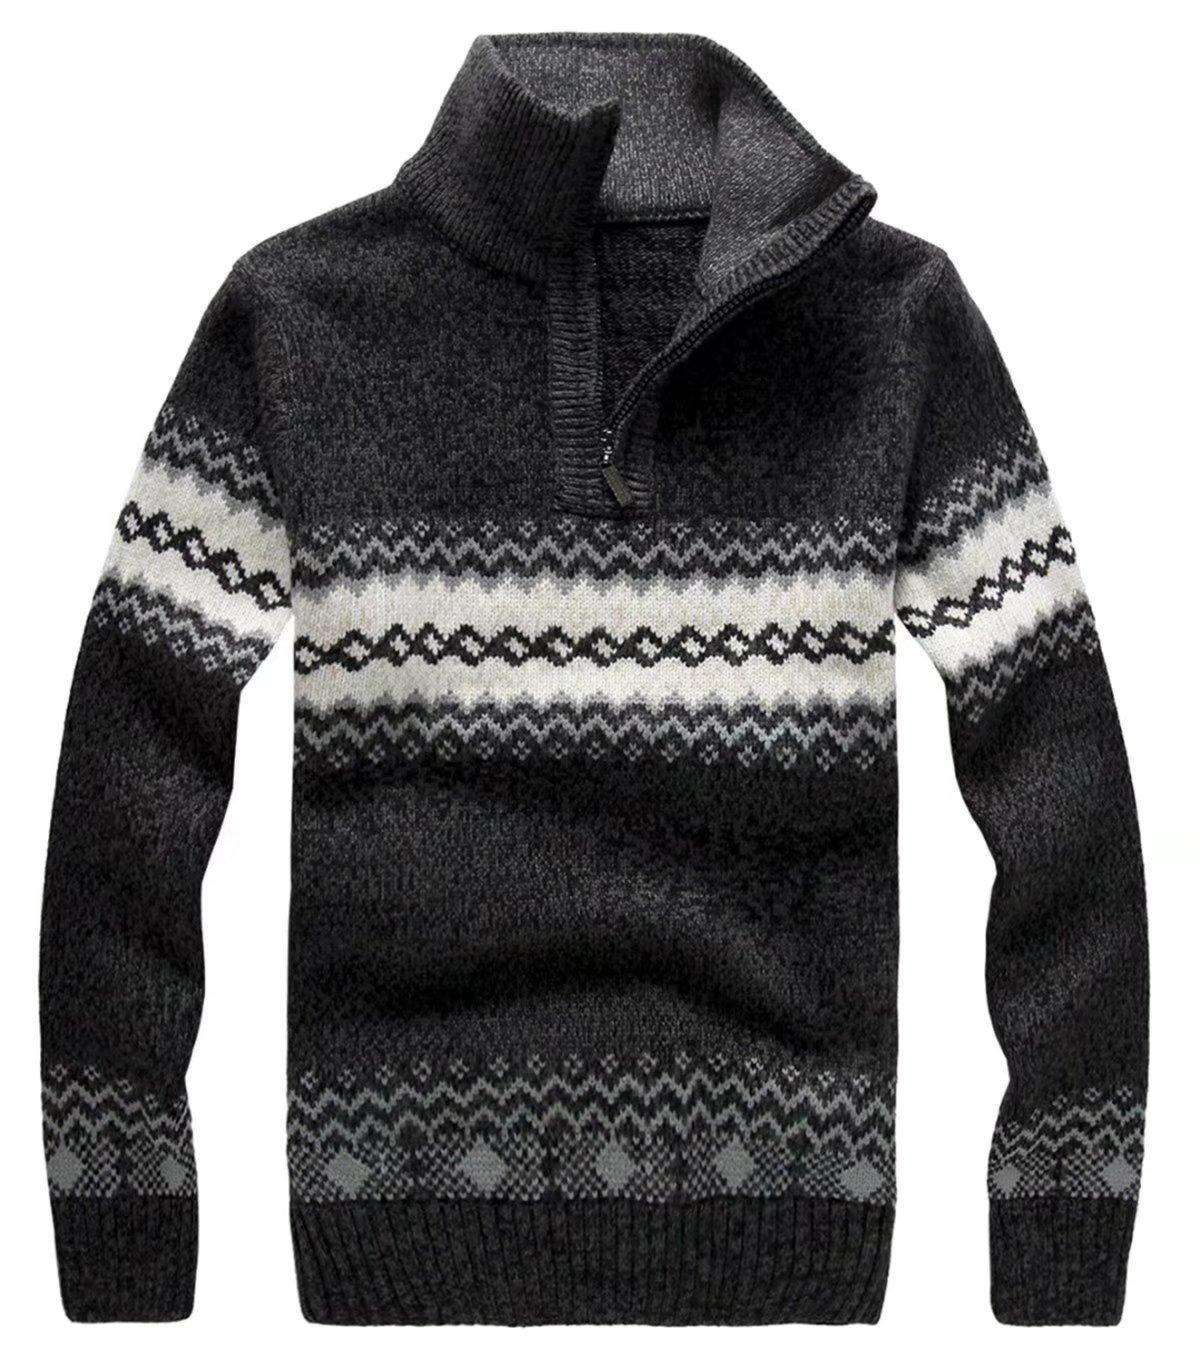 EMAOR Mens Quarter-zip Long Sleeve Jacquard Knit Sweater Pullover